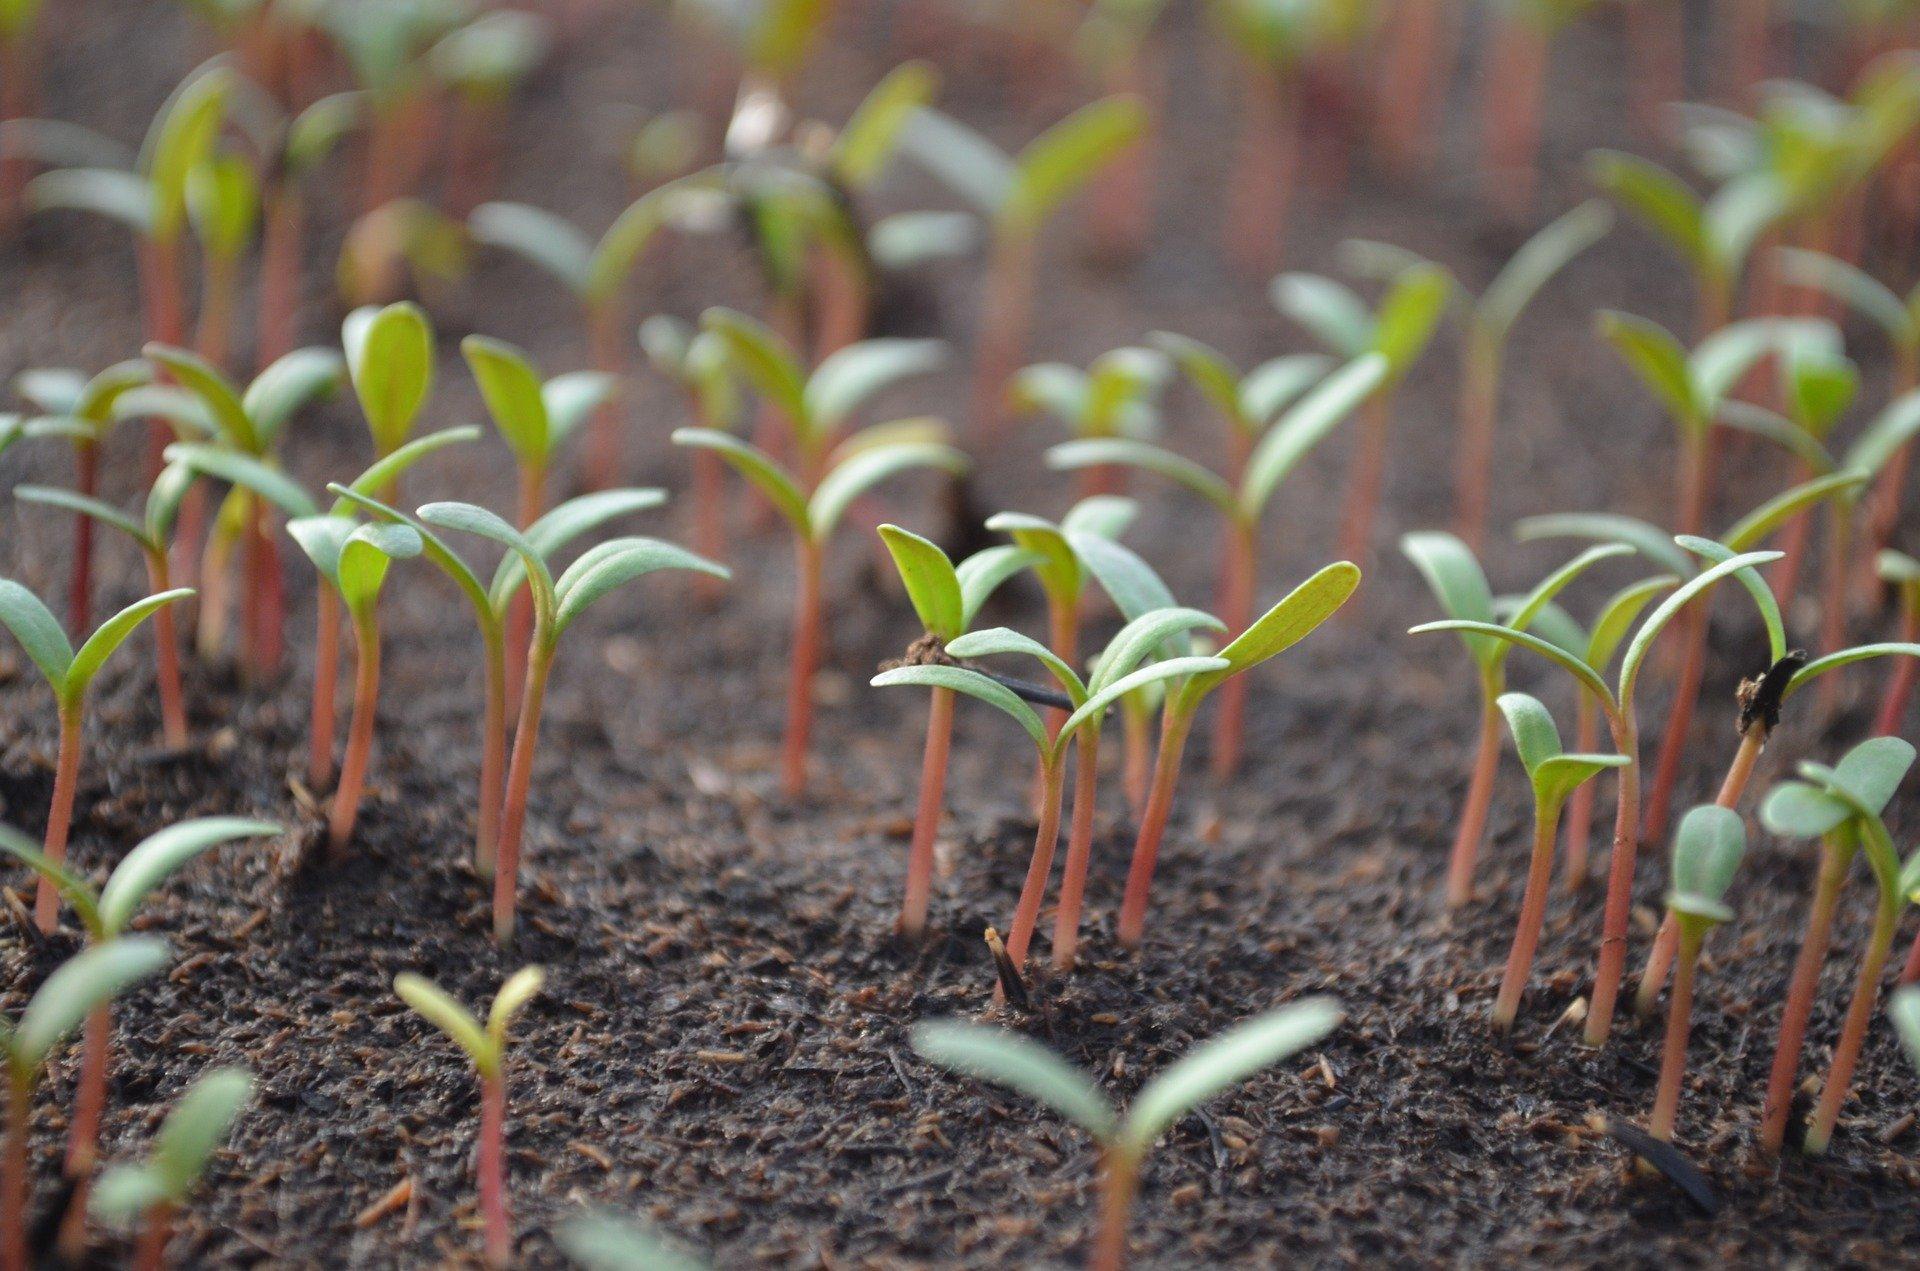 Les semis en serre